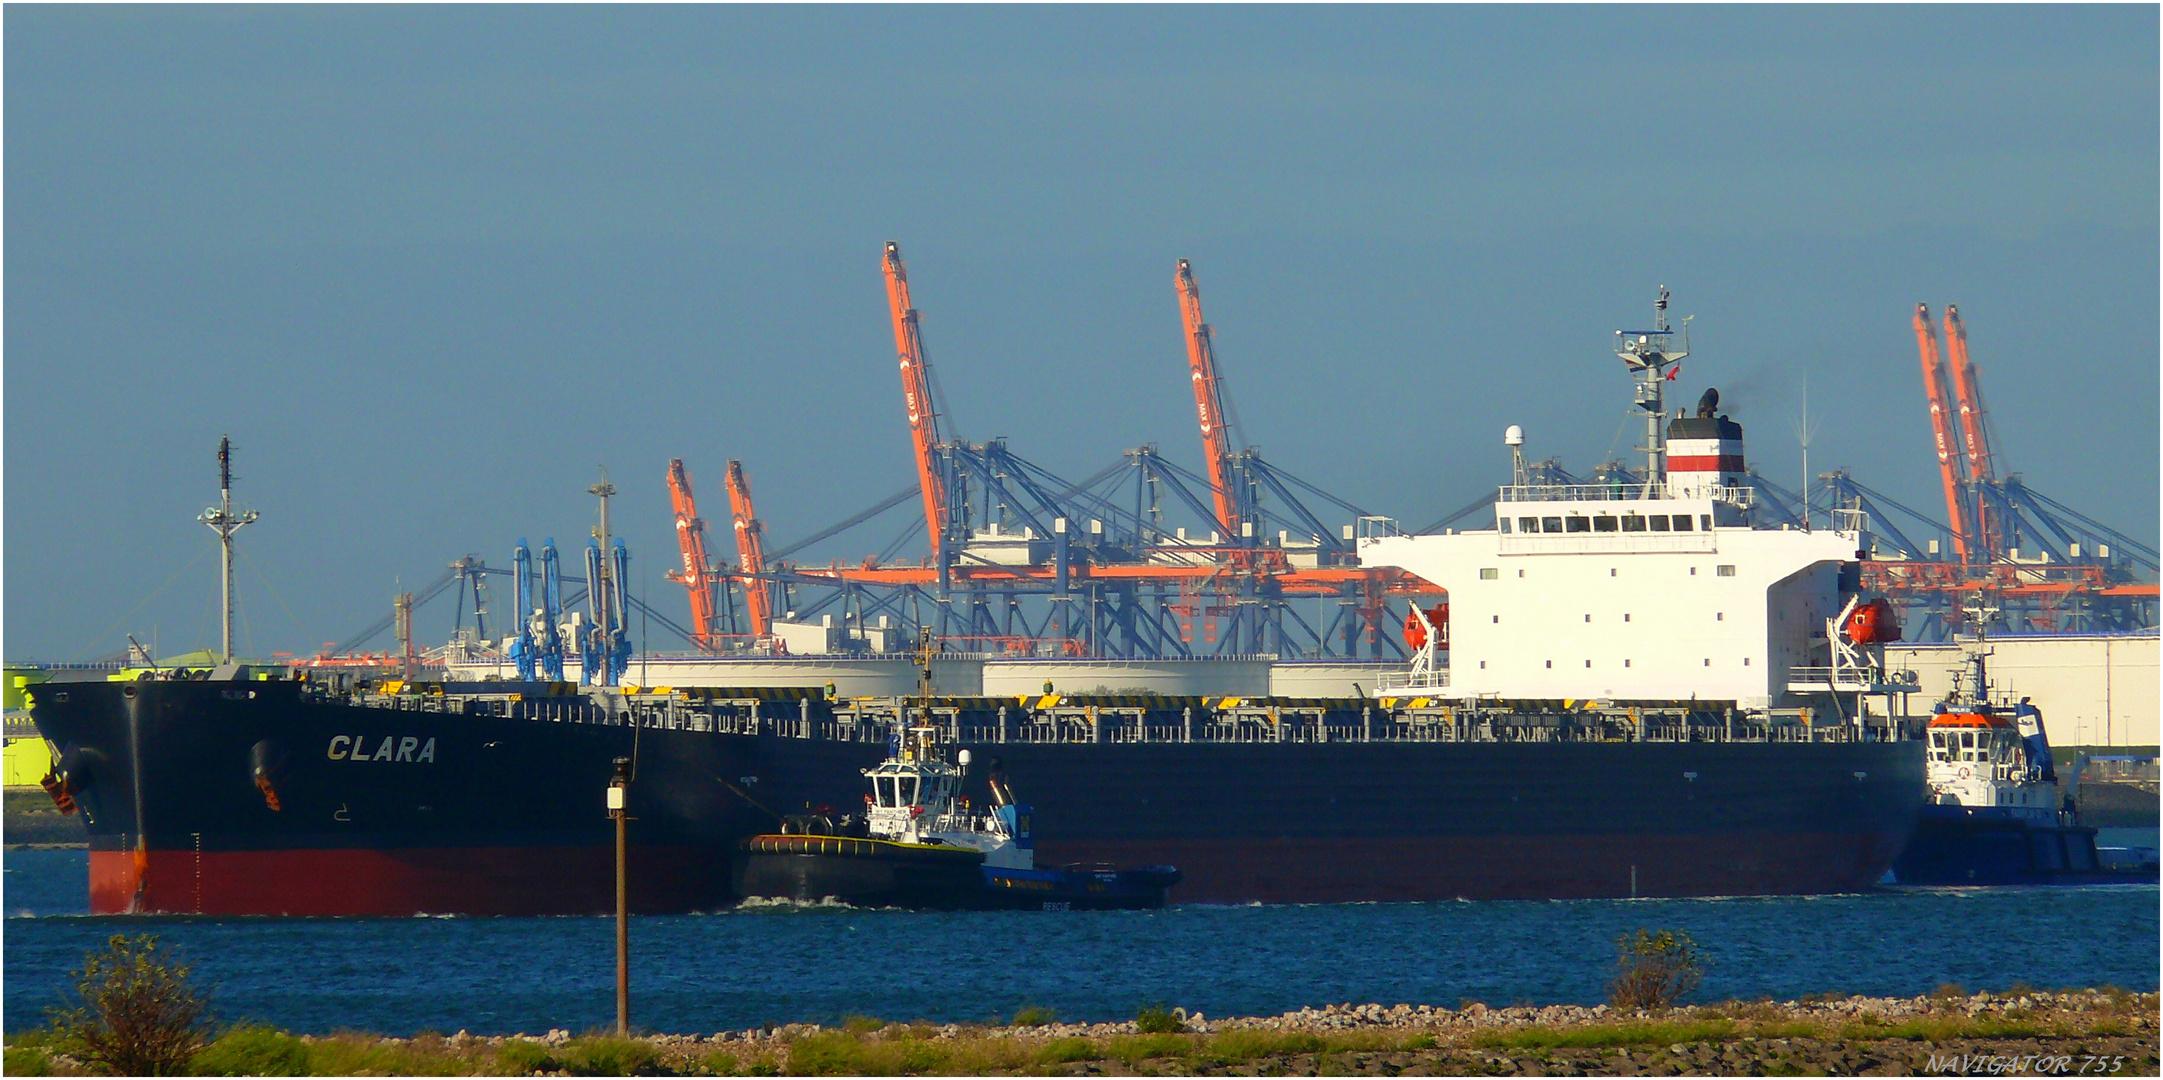 CLARA, Bulk carrier , Calandkanal / Rotterdam/ 23.10.2013